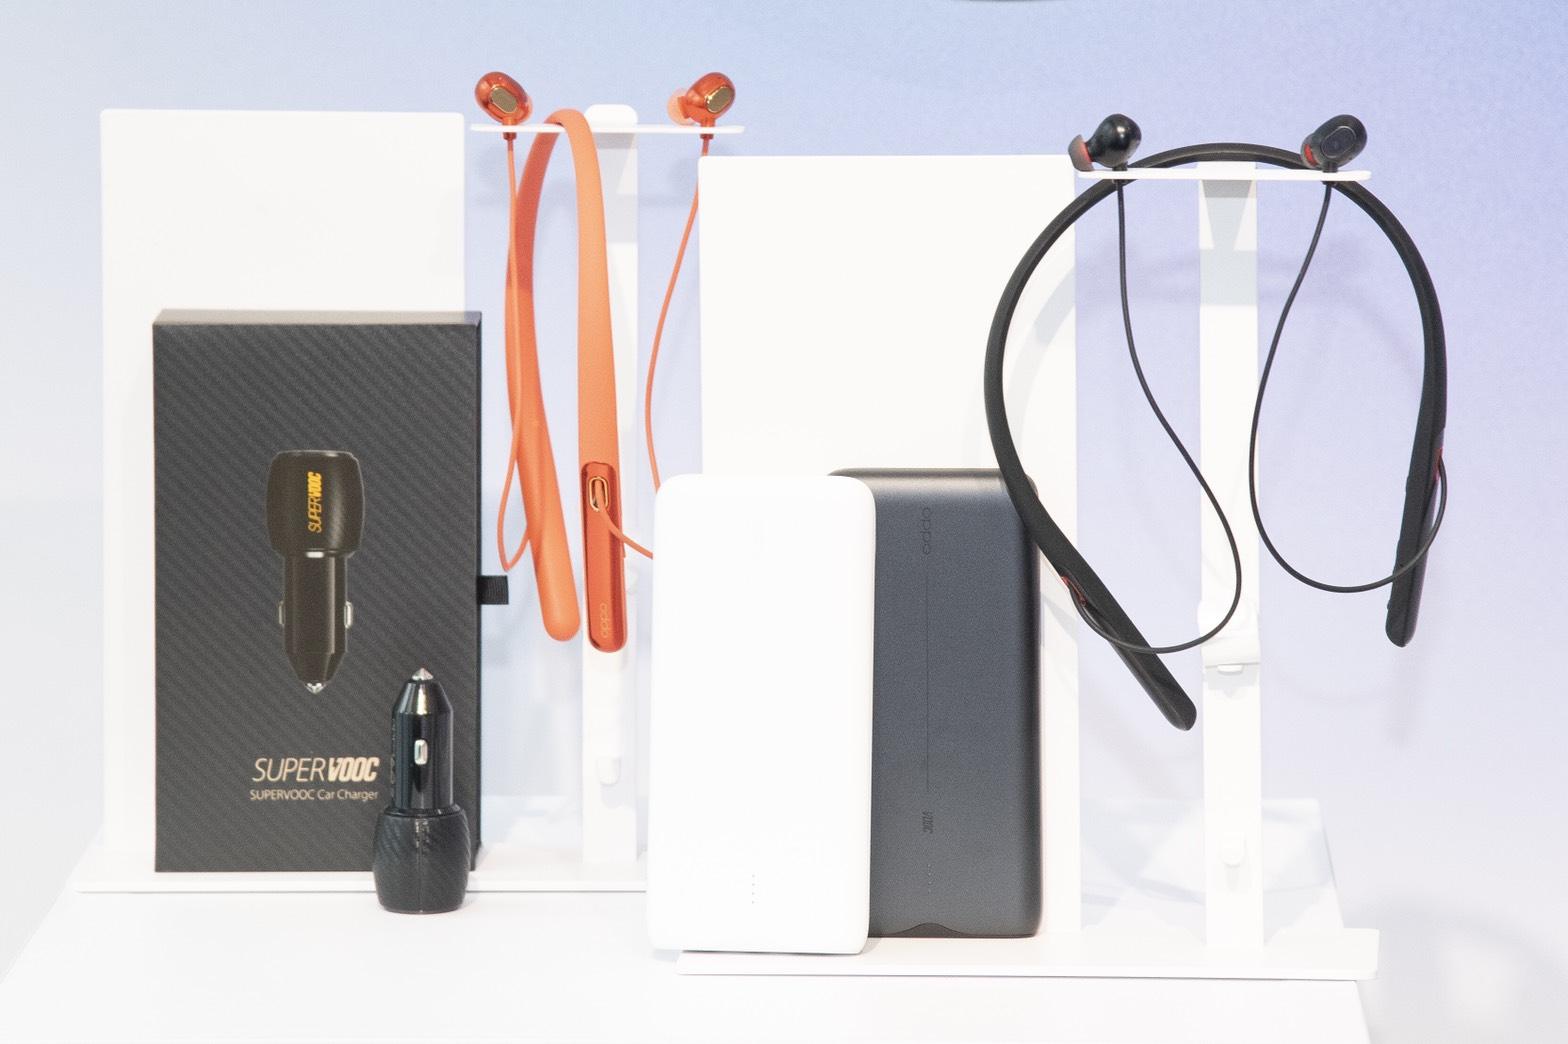 OPPO無線耳機系列OPPO Enco Q1與無線耳機OPPO Enco M1也正式亮相,預計10月中上市,一體成形結合科技與藝術